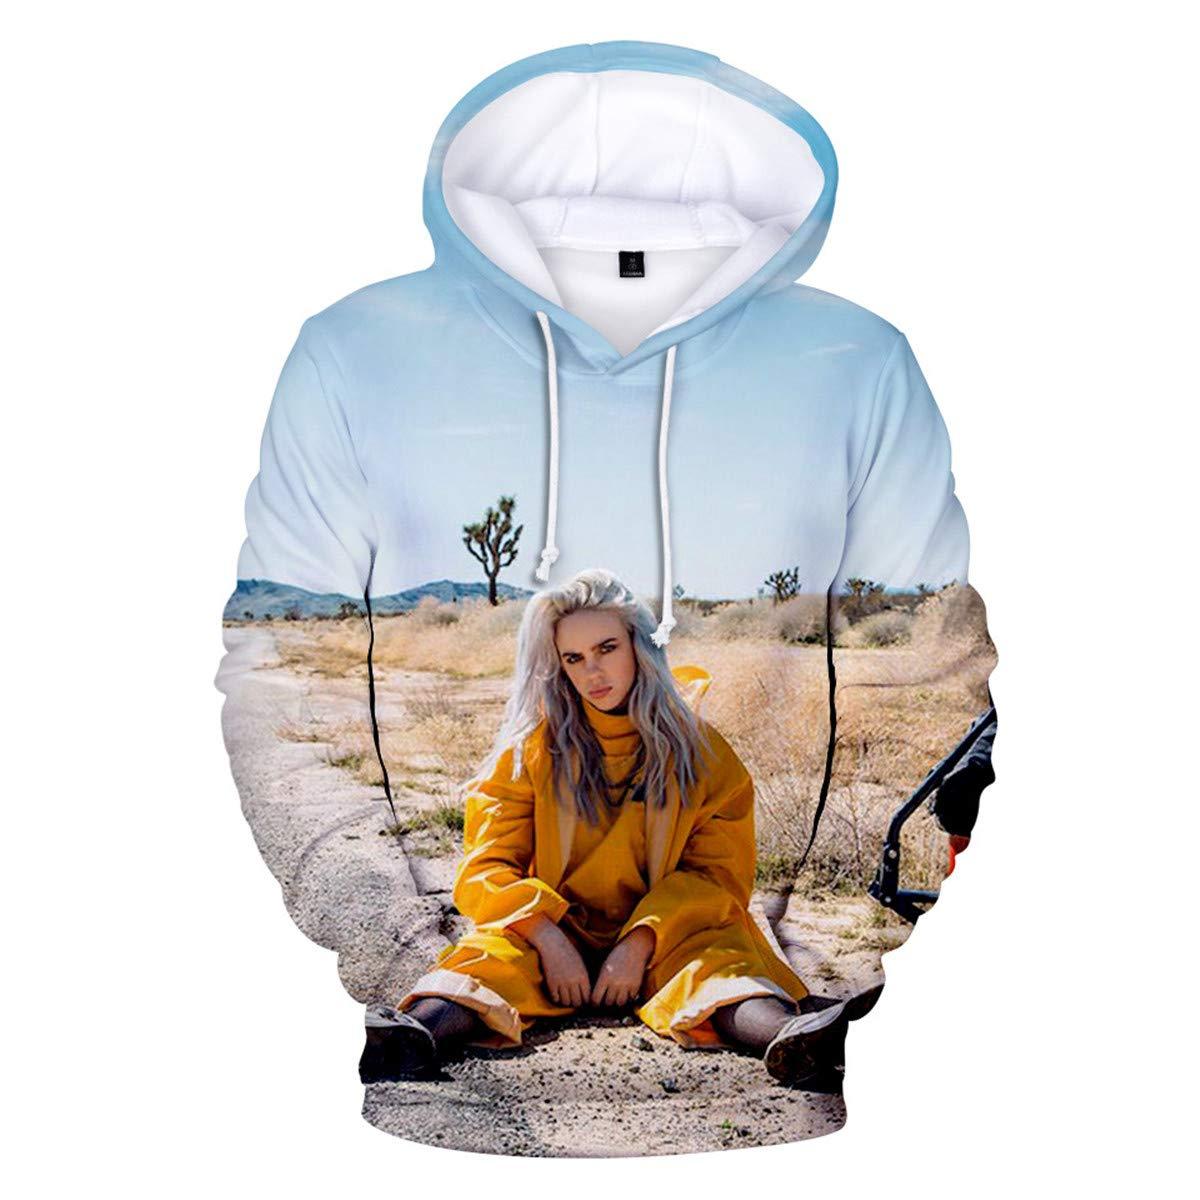 Unisex Billie Eilish Fans Felpa con Cappuccio Hip Pop Cool Pullover Instagram Felpa novit/à Streetwear per Uomo Donna Teen